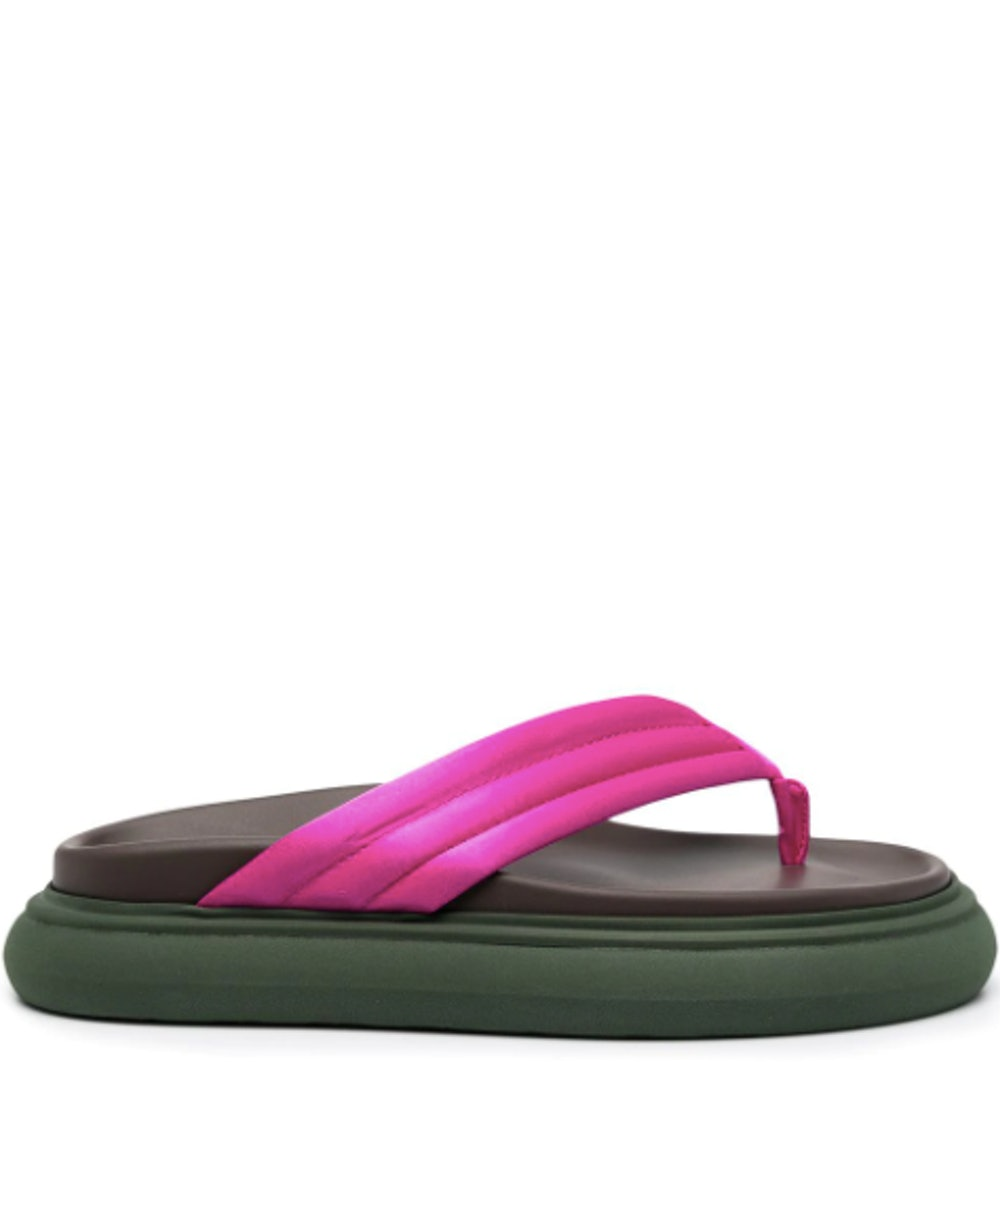 thong strap platform sandals